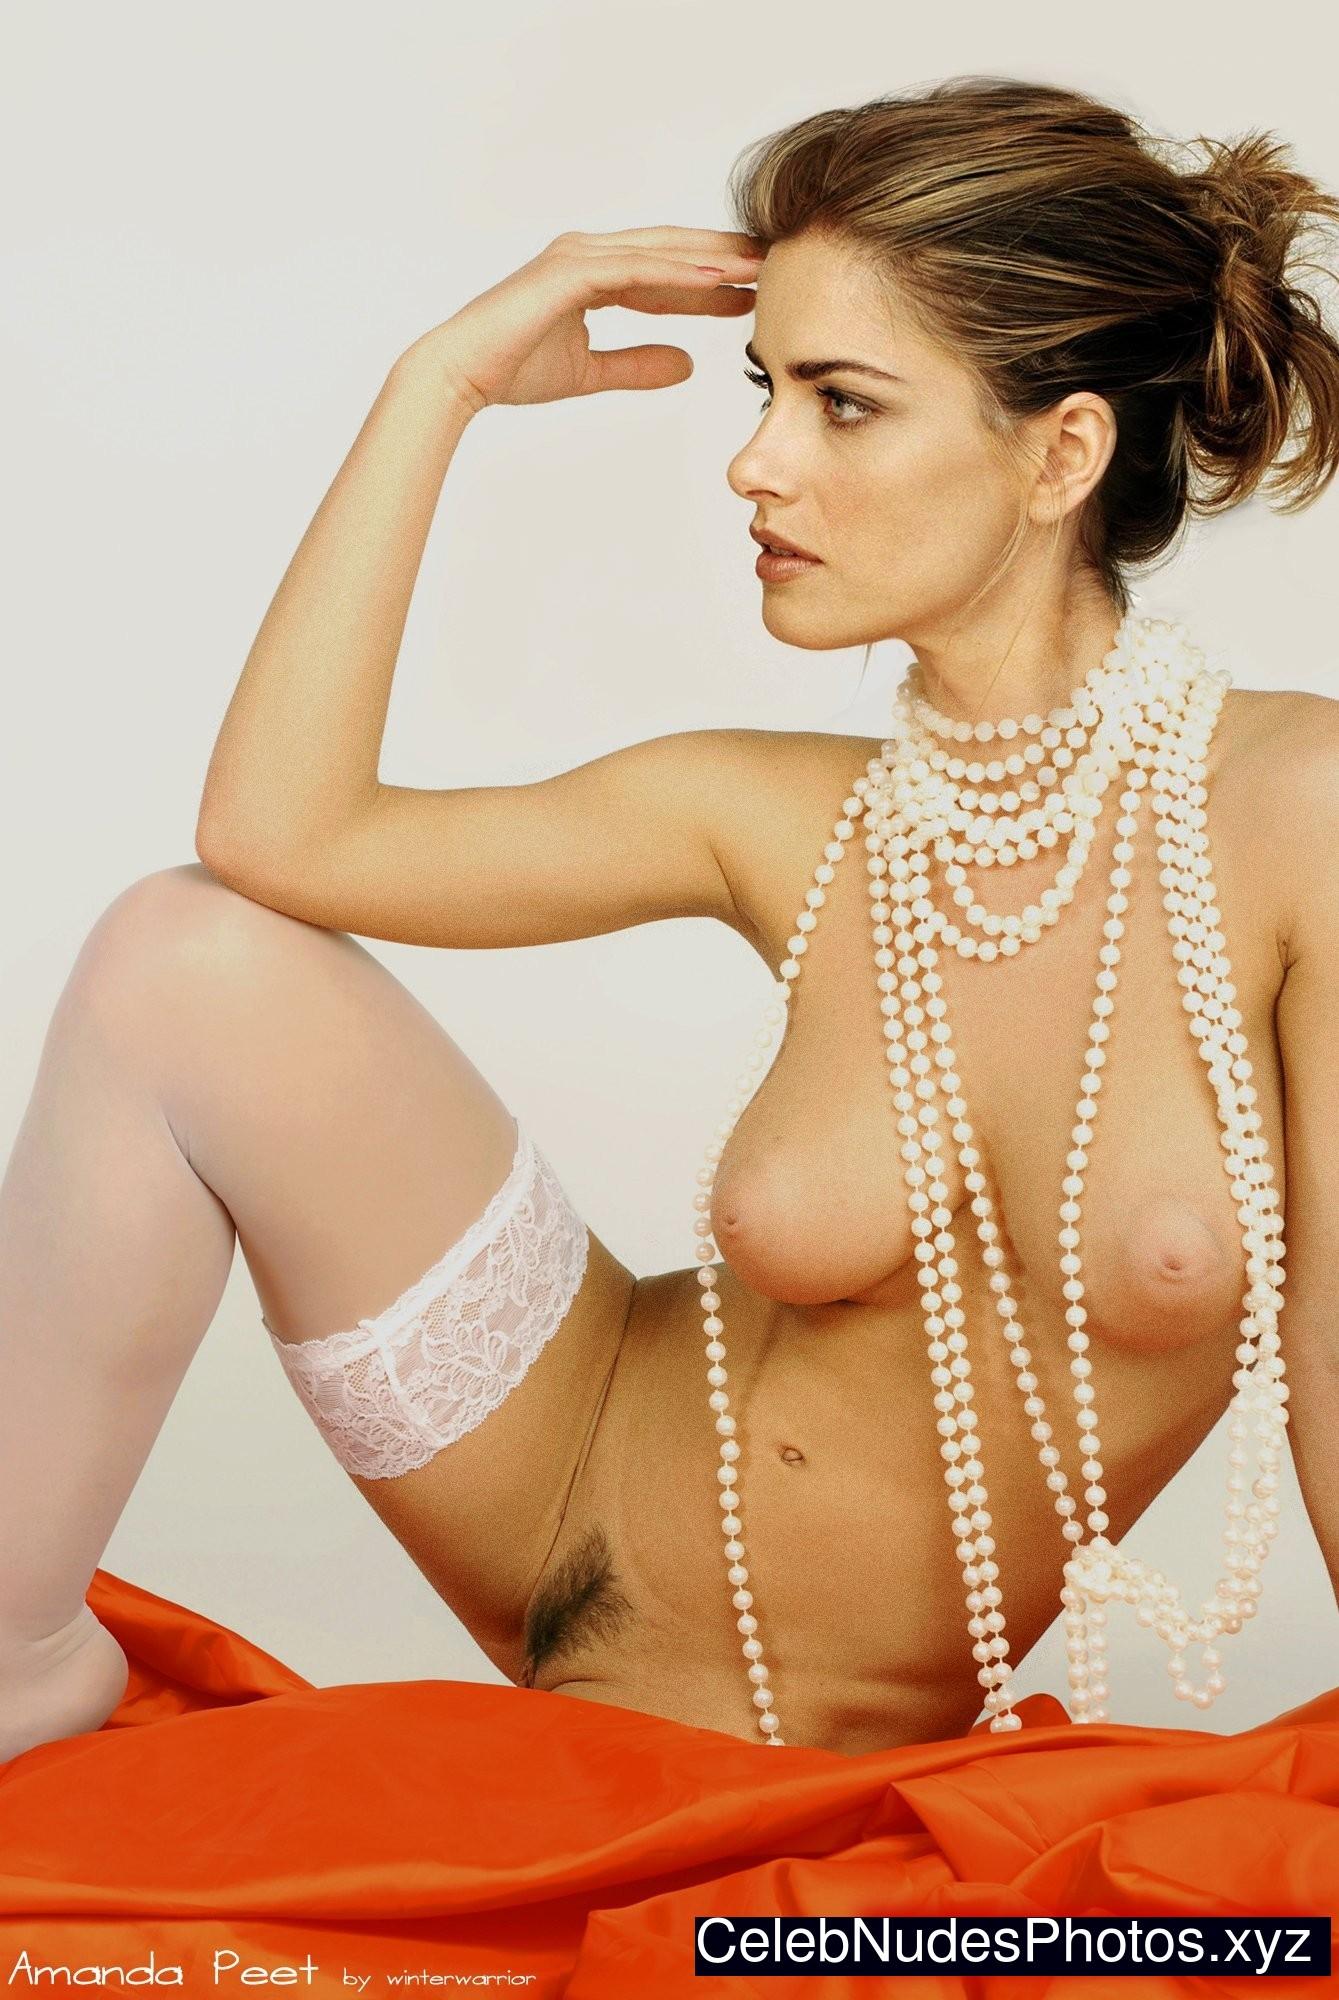 Amanda peet fake nude naked